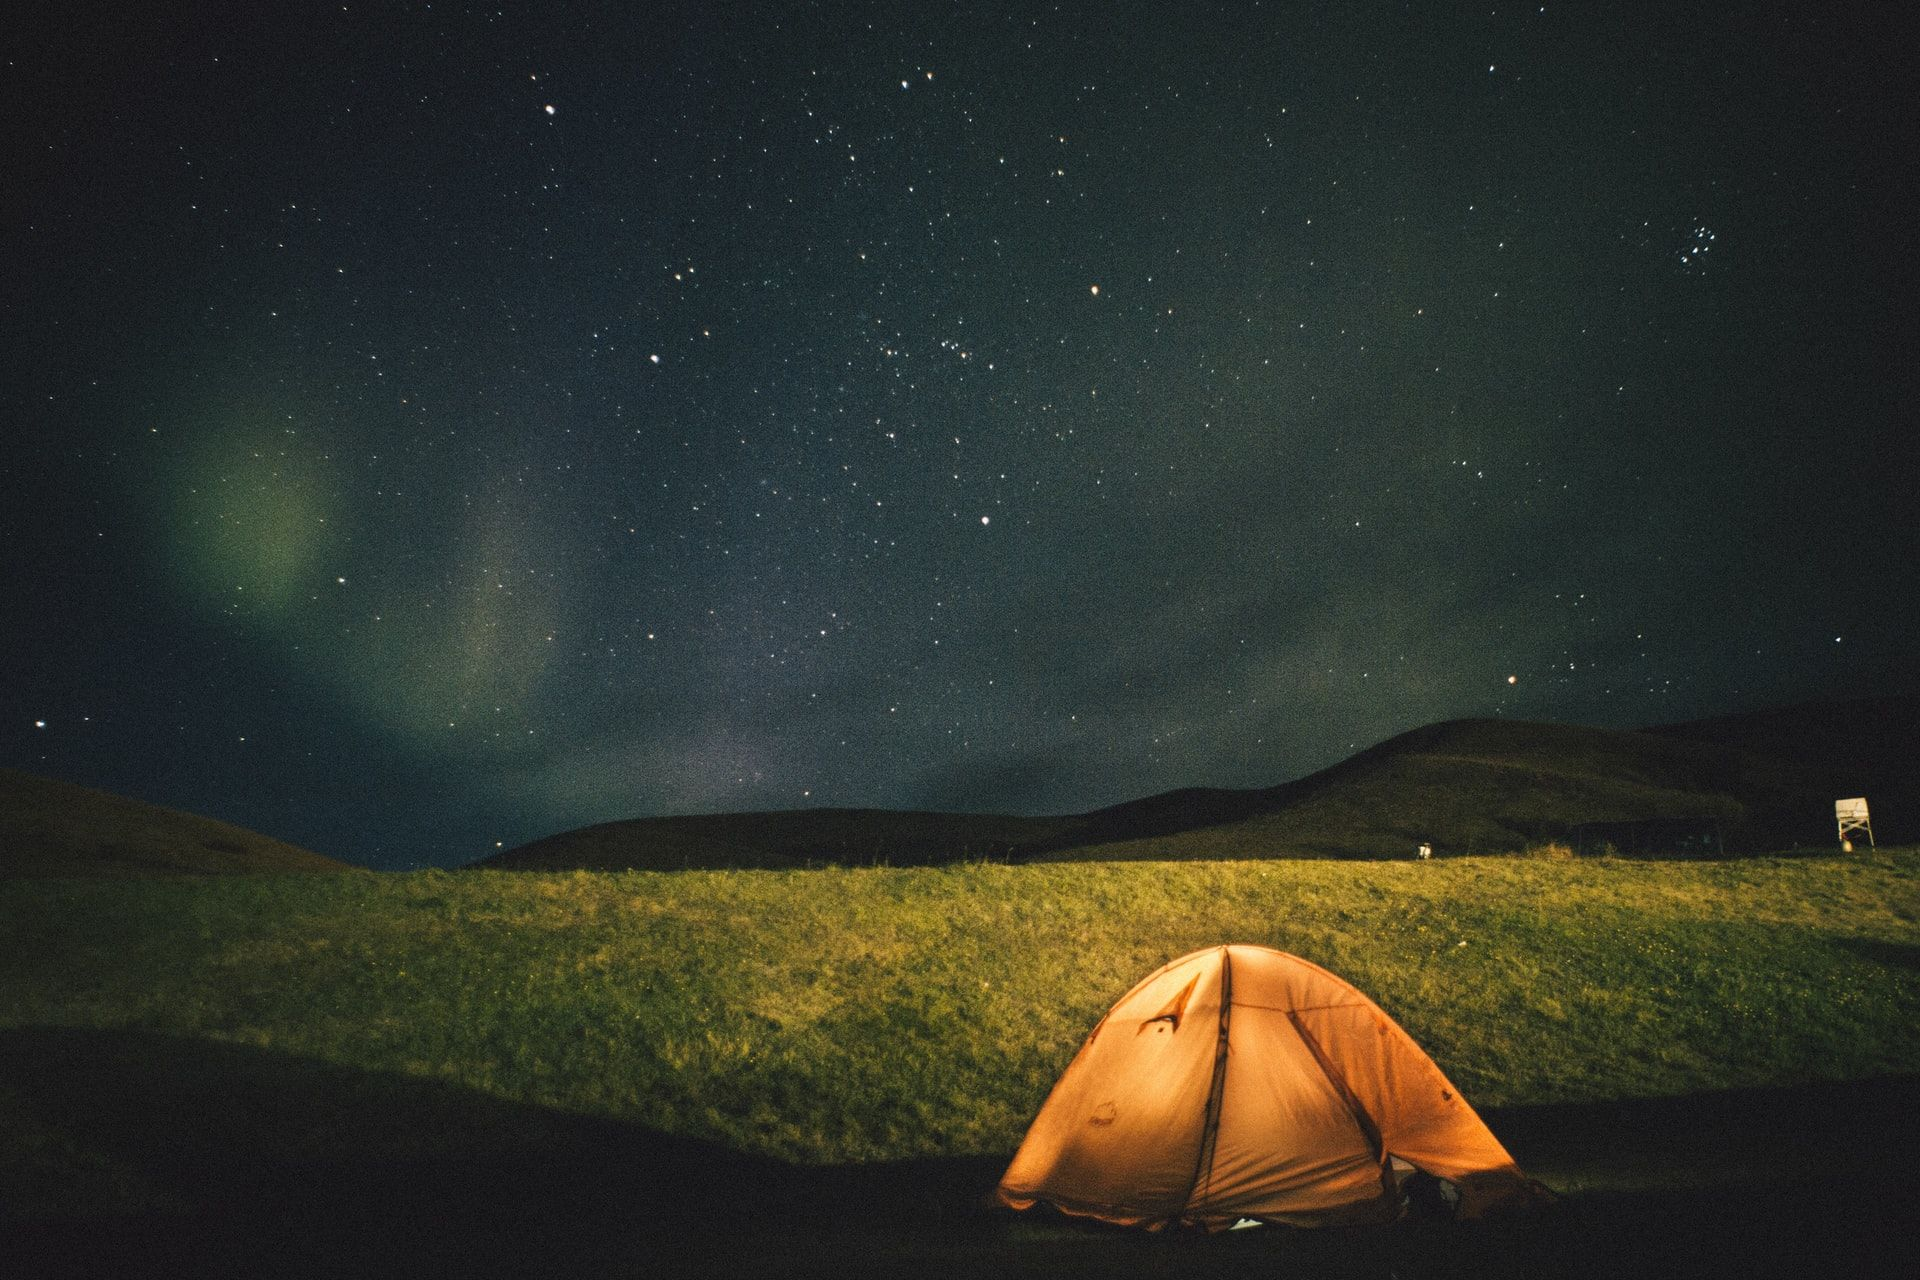 Auf campingplatz sex dem Urlaub auf